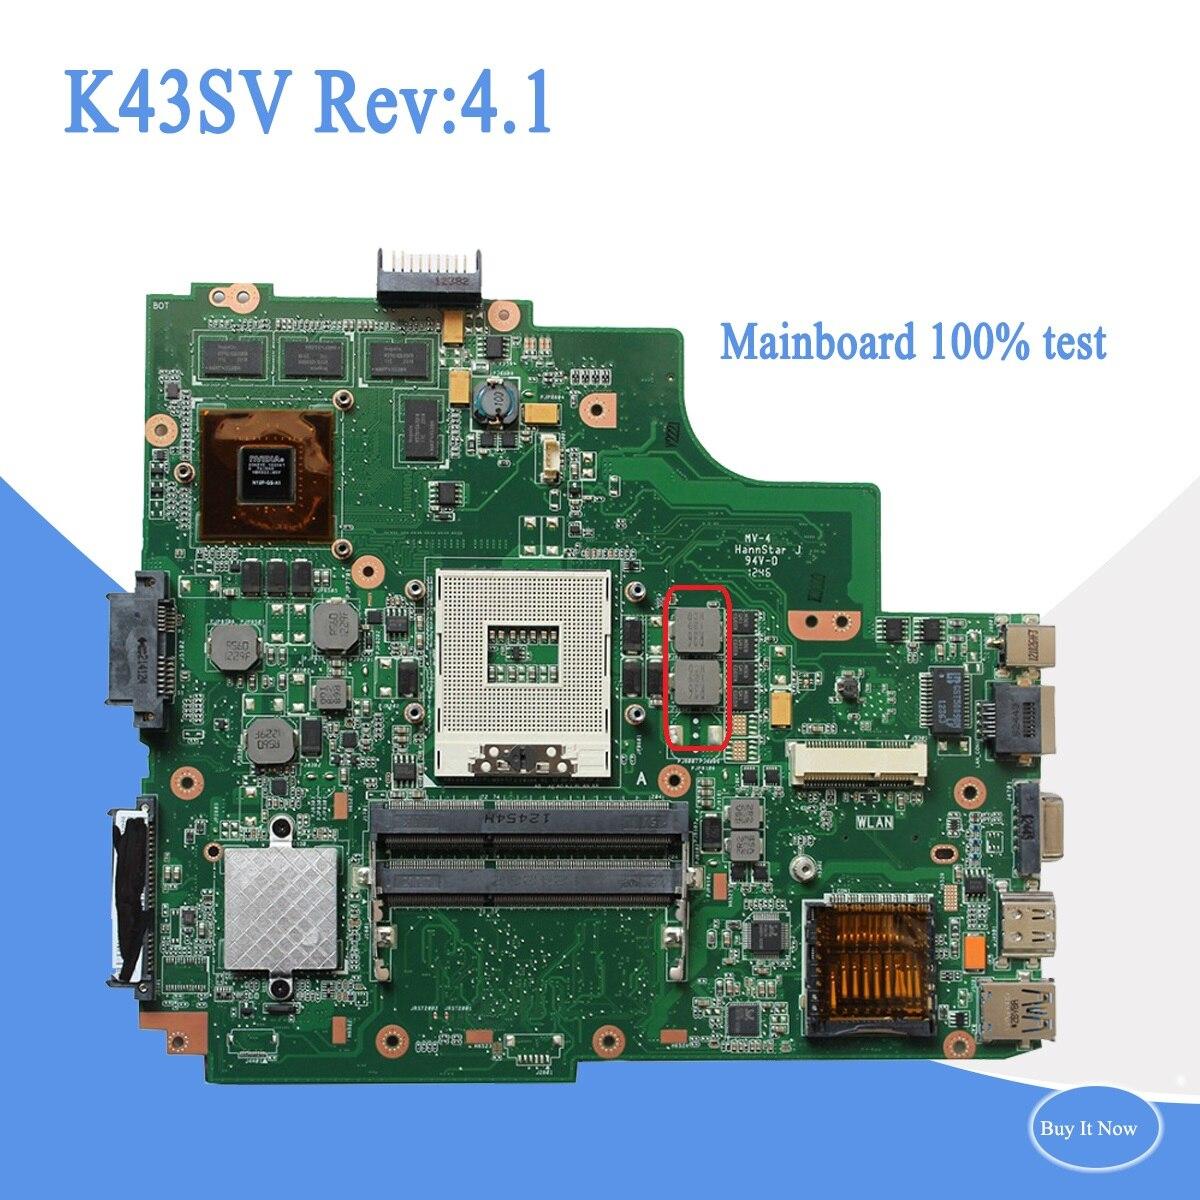 Motherboards Computerkomponenten K43sv Rev4.1 Usb3.0 Für Asus K43sv A43s K43s X43s P43s P43sj K43sj A83s A84s K43sm Laptop Motherboard 8 Stücke Speicher Volle Test Neueste Mode